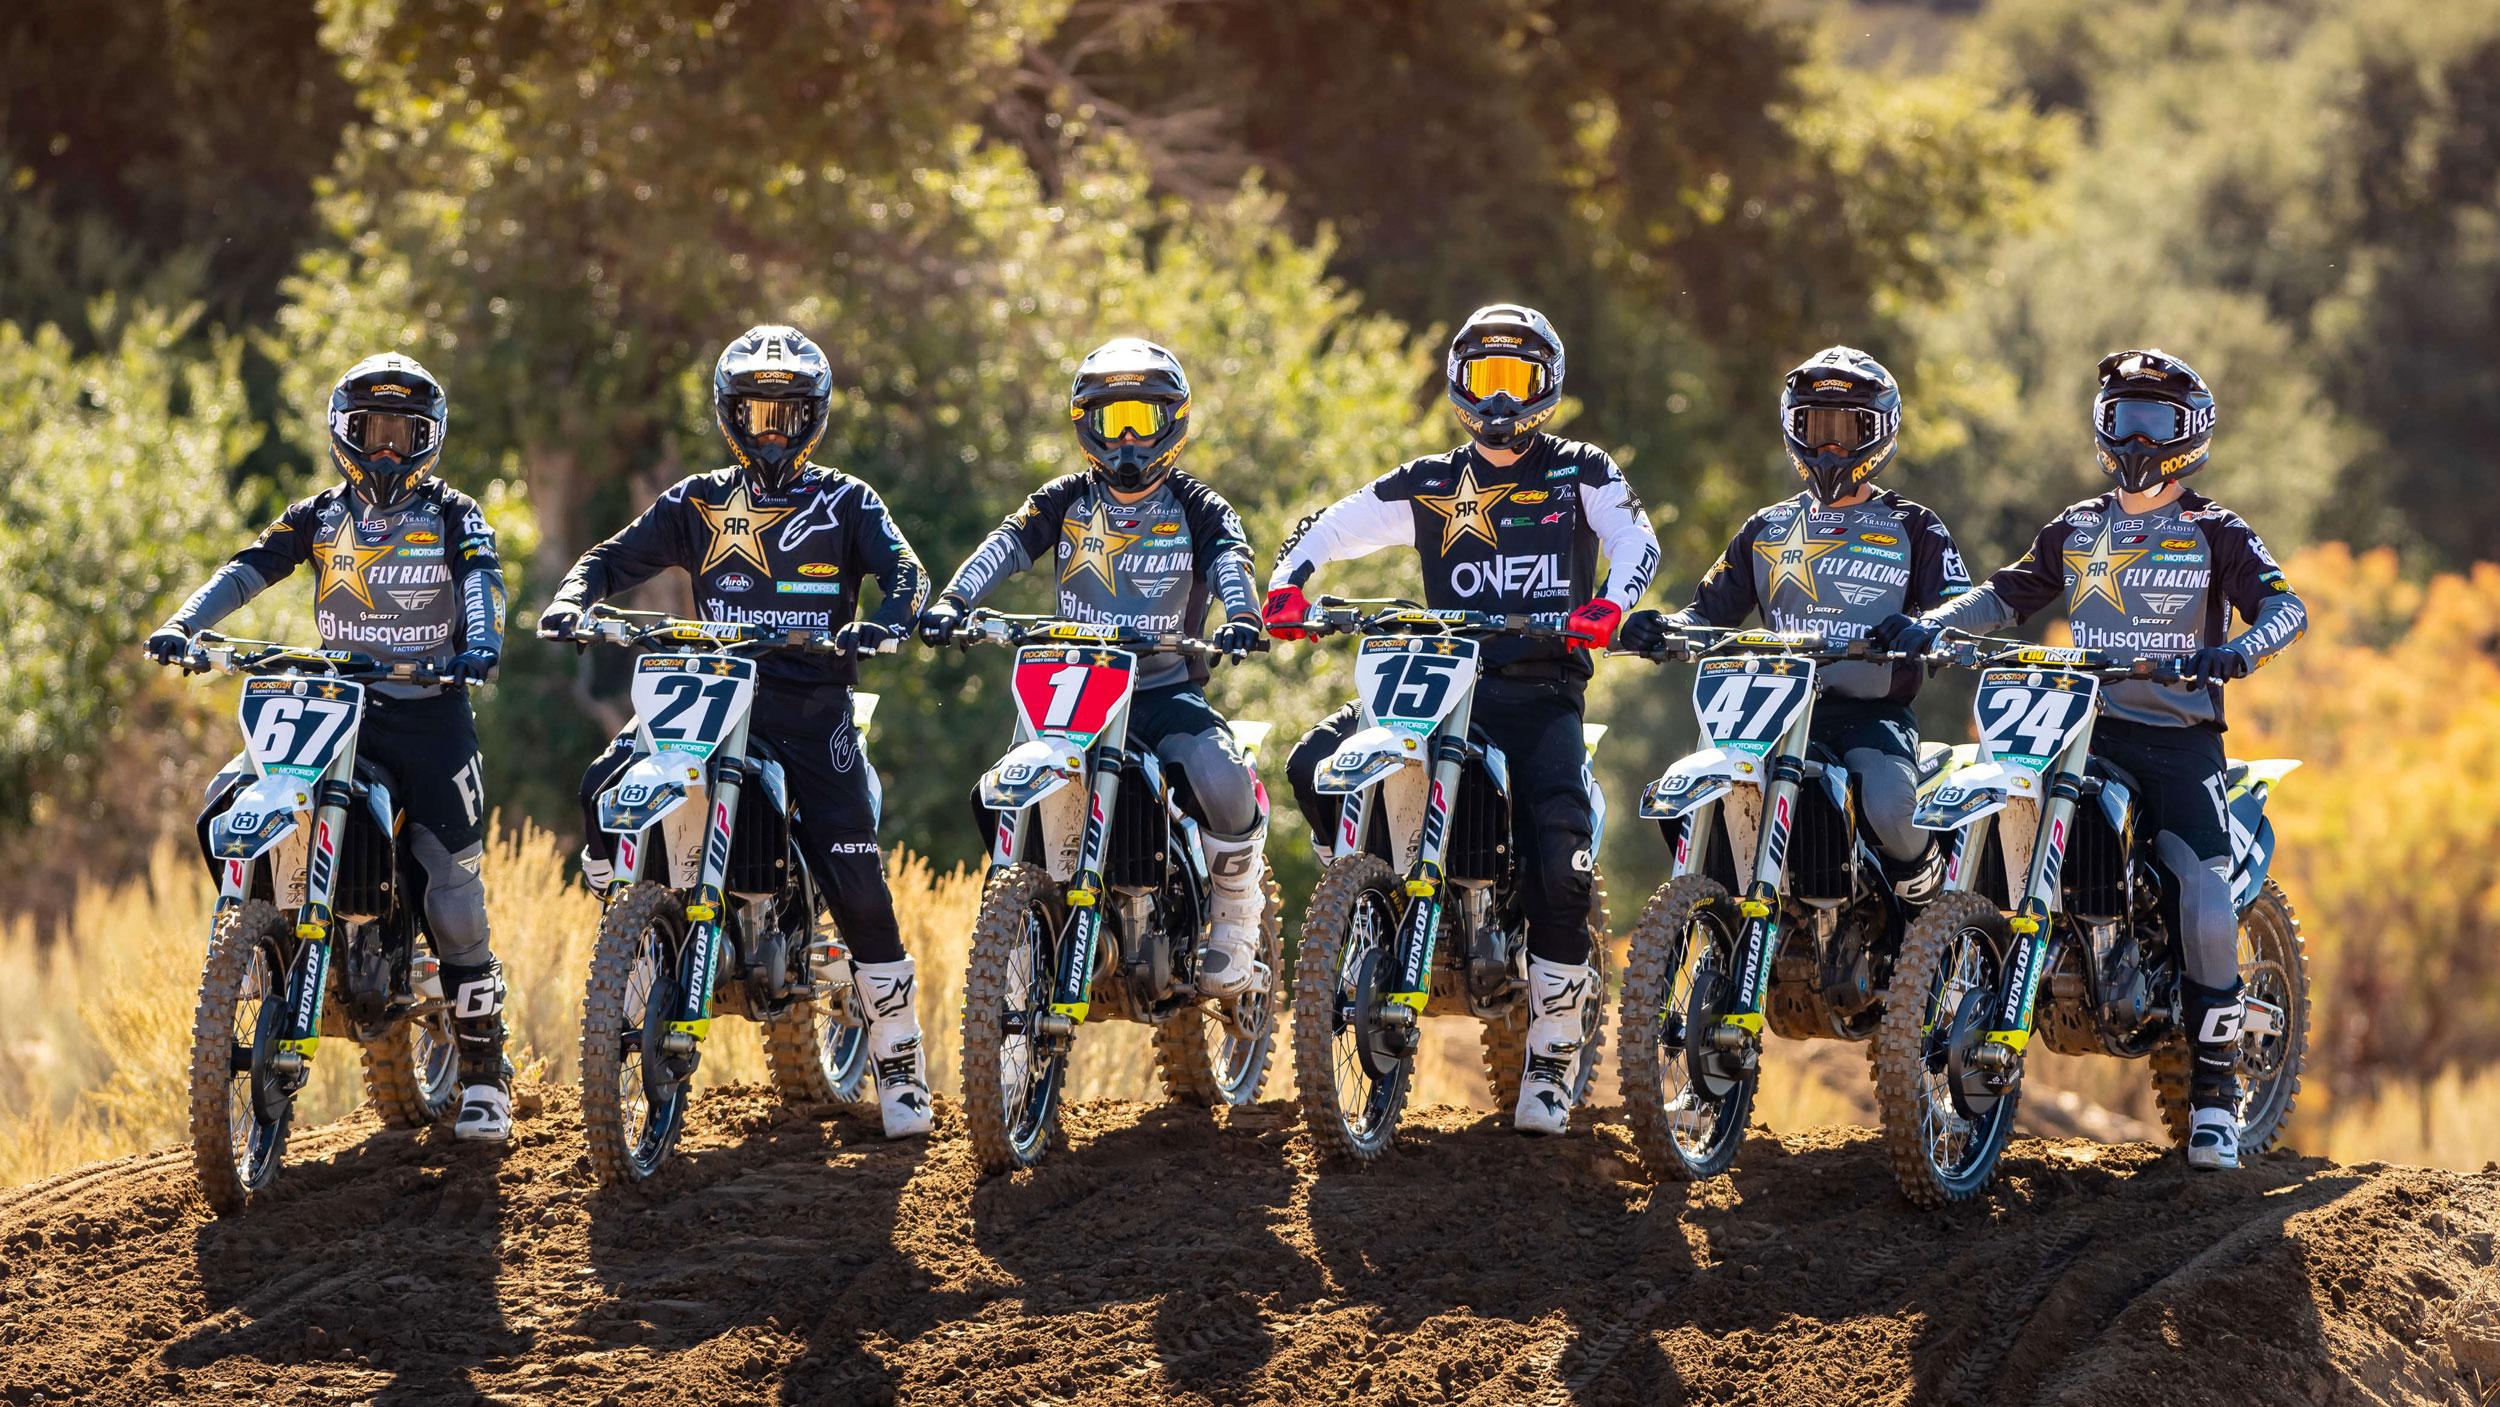 2021 Team Rockstar Energy Husqvarna riders